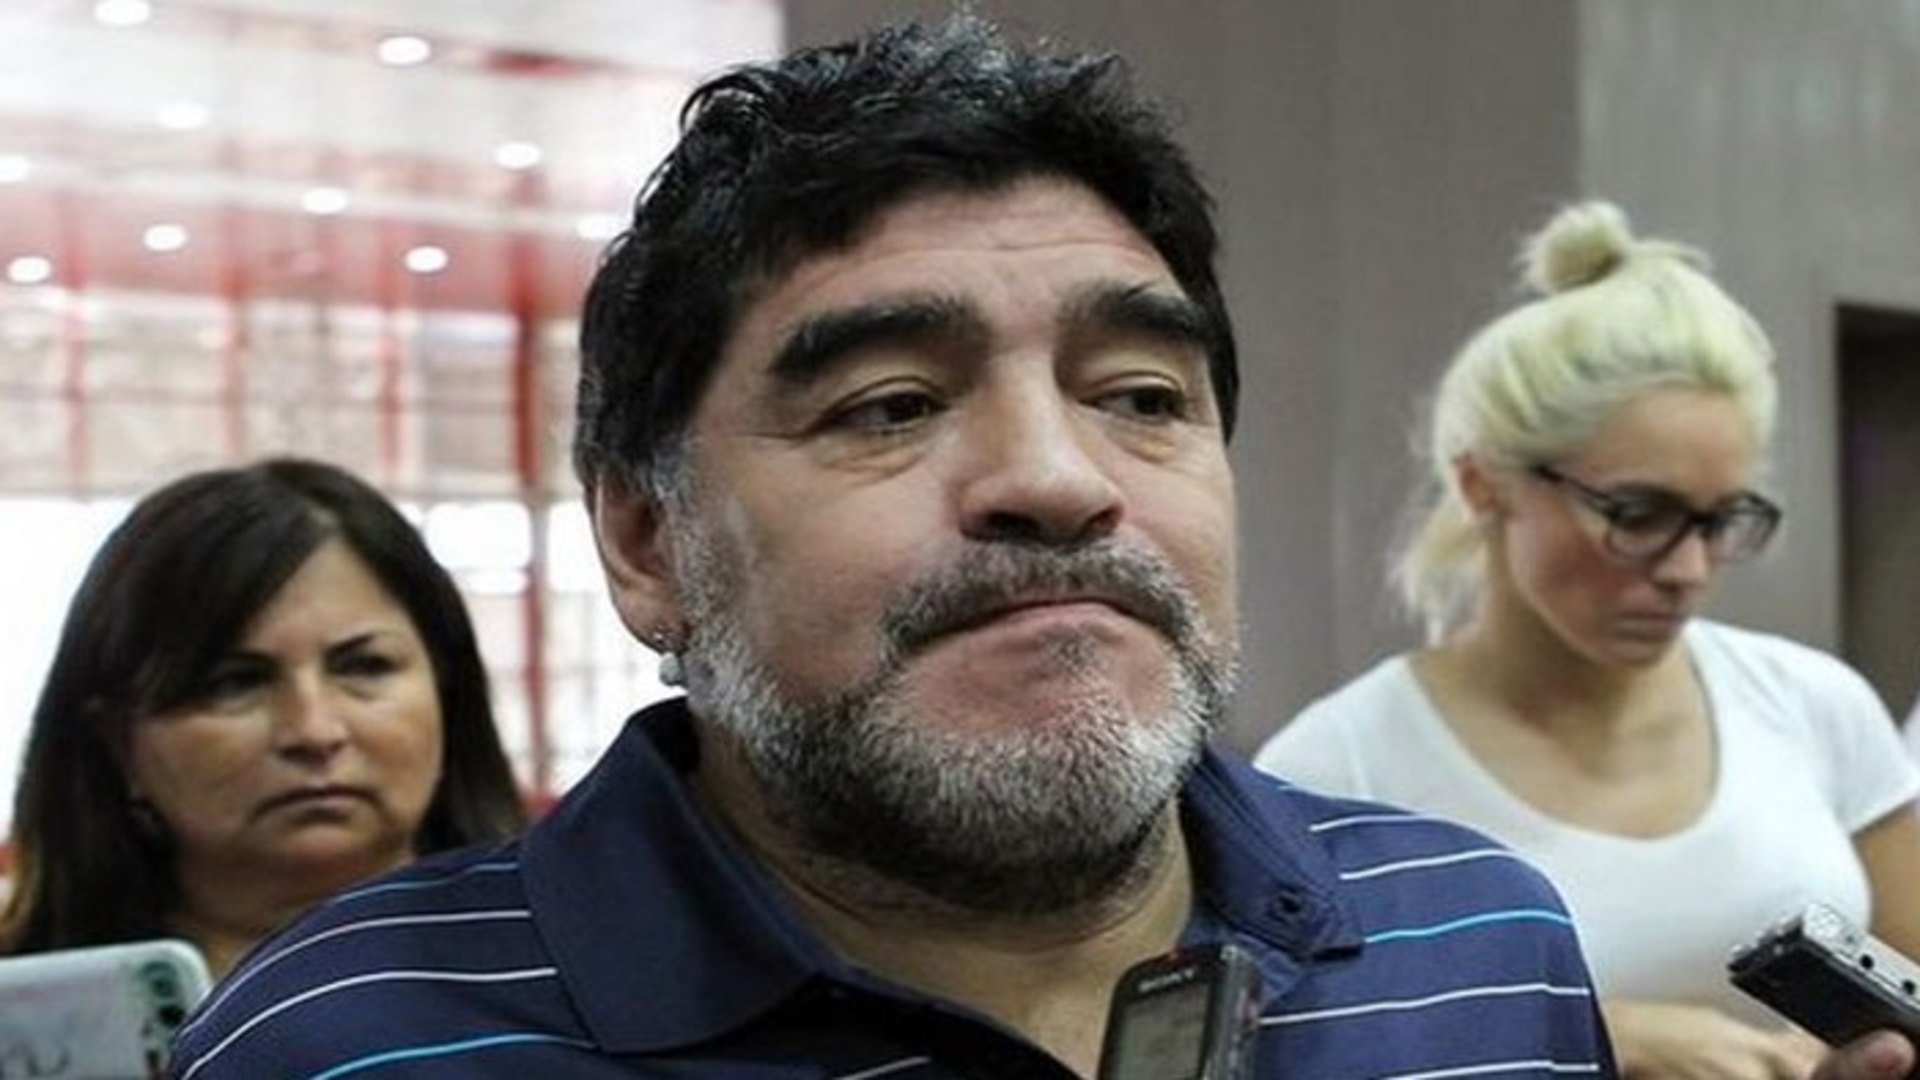 Falleció Diego Maradona de un paro respiratorio